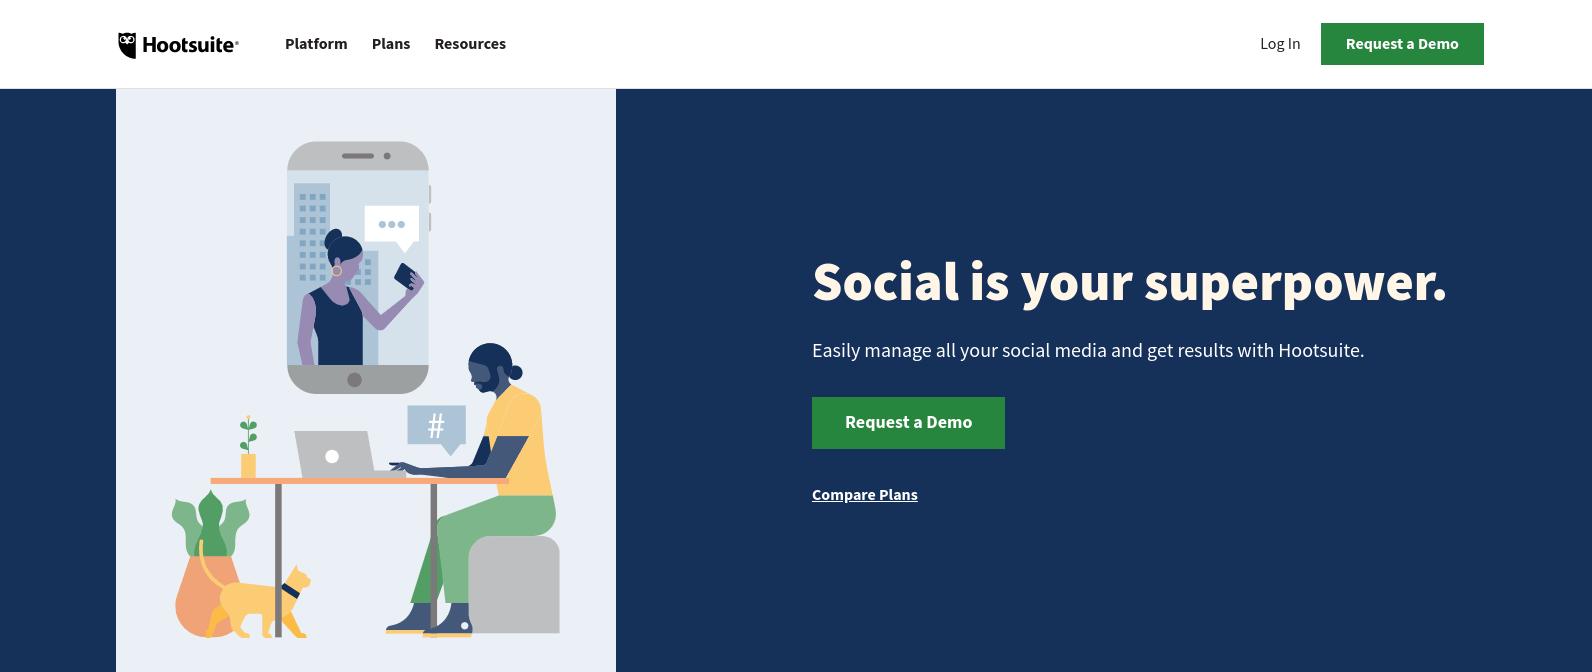 The Hootsuite website.